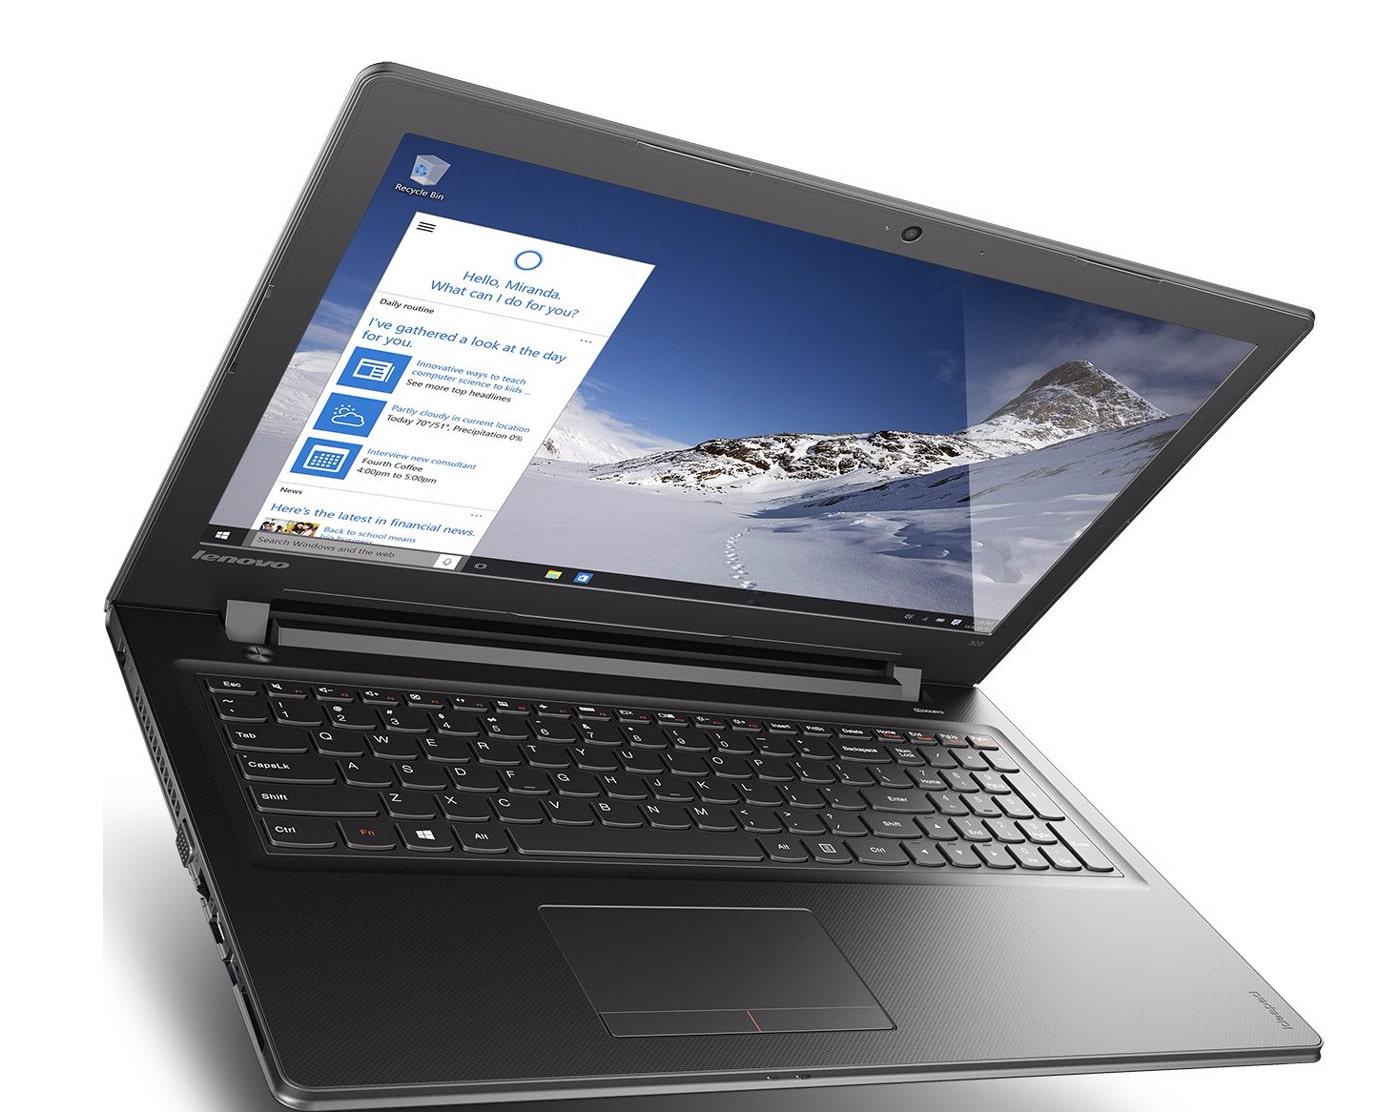 "<span class=""toptagtitre"">Promo ! </span>Lenovo Ideapad 300-17ISK, PC portable 17 pouces 2 To Core i5 8 Go à 529€"